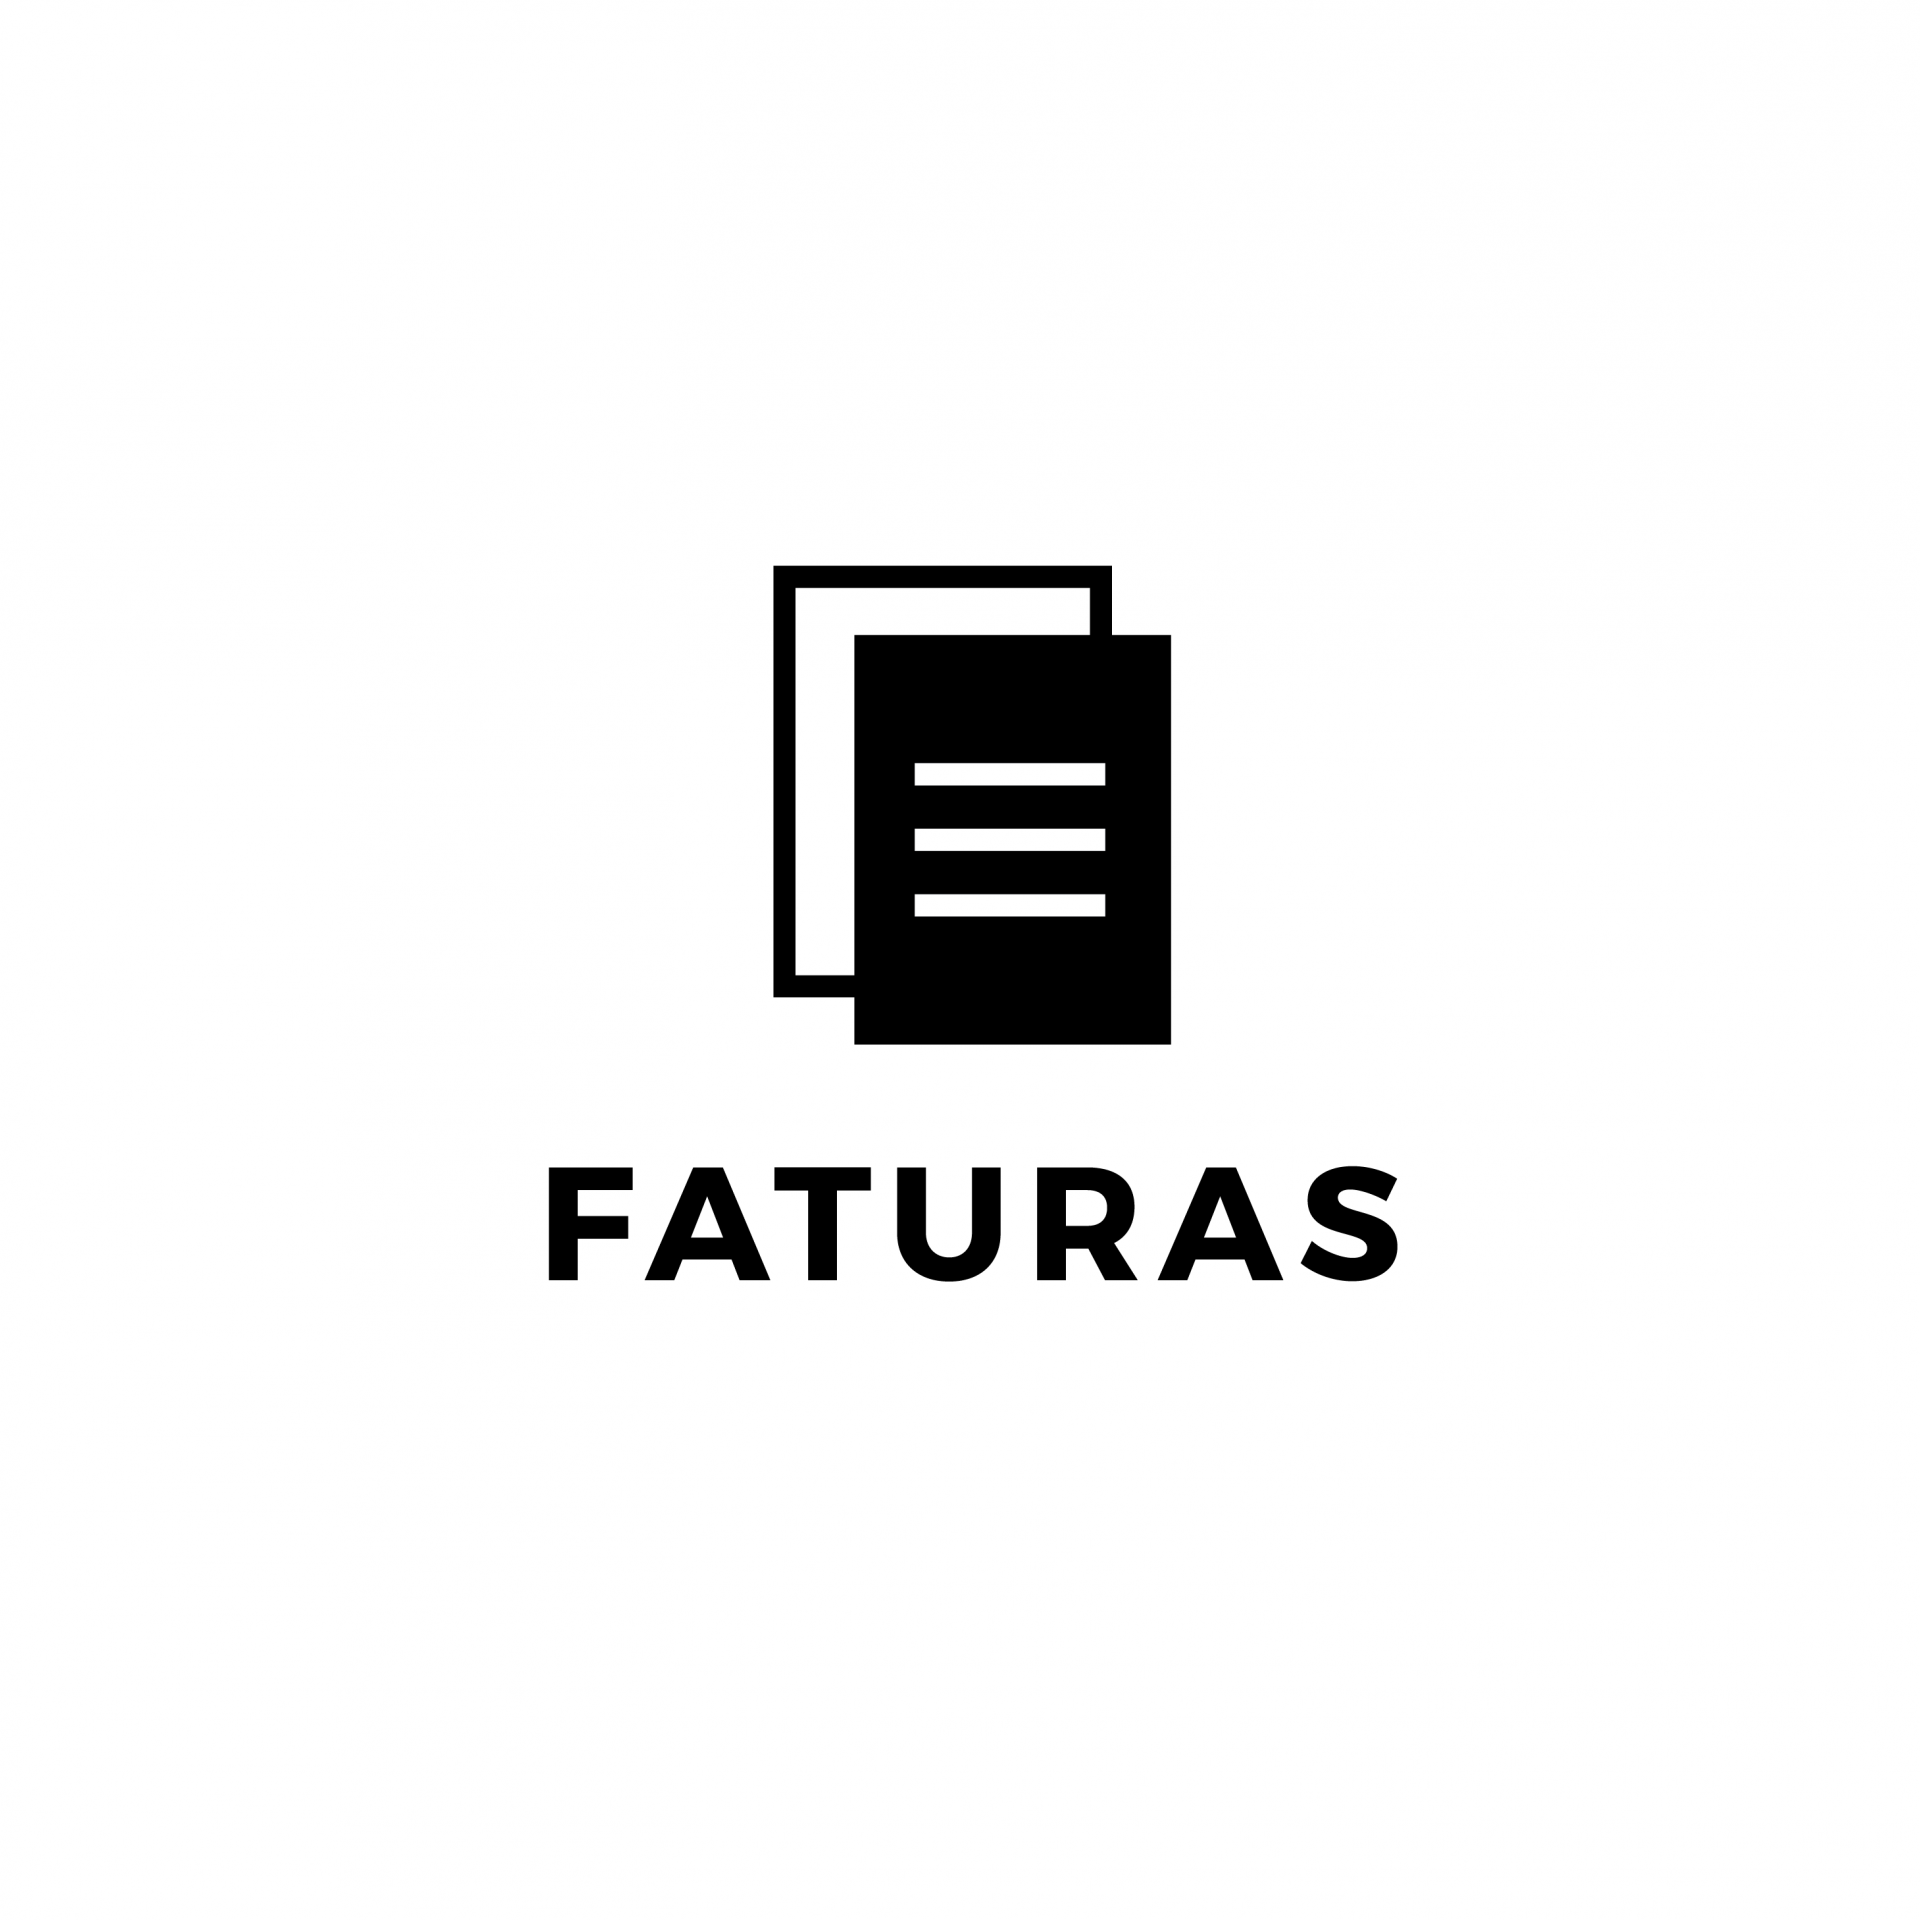 Faturas 01